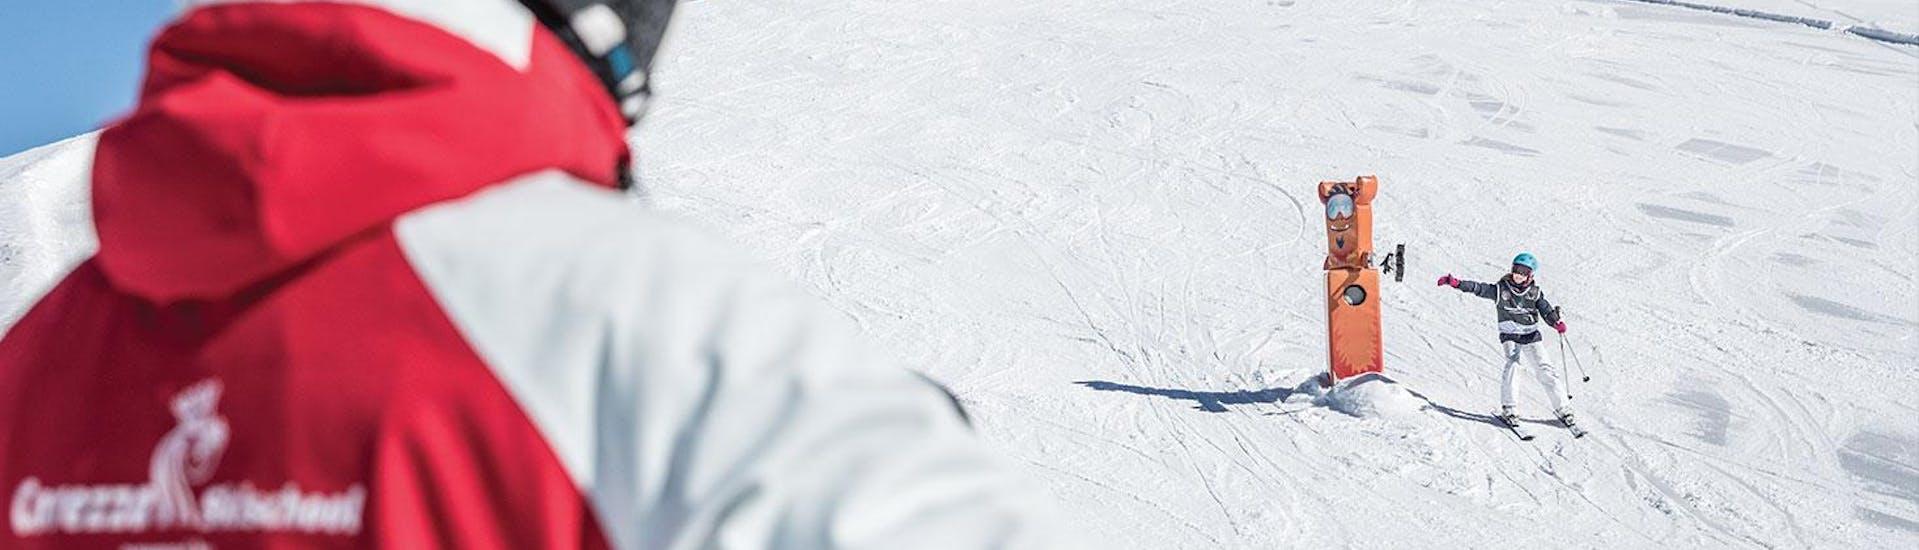 Private Ski Lessons for Kids - All Levels met Carezza Skischool - Hero image